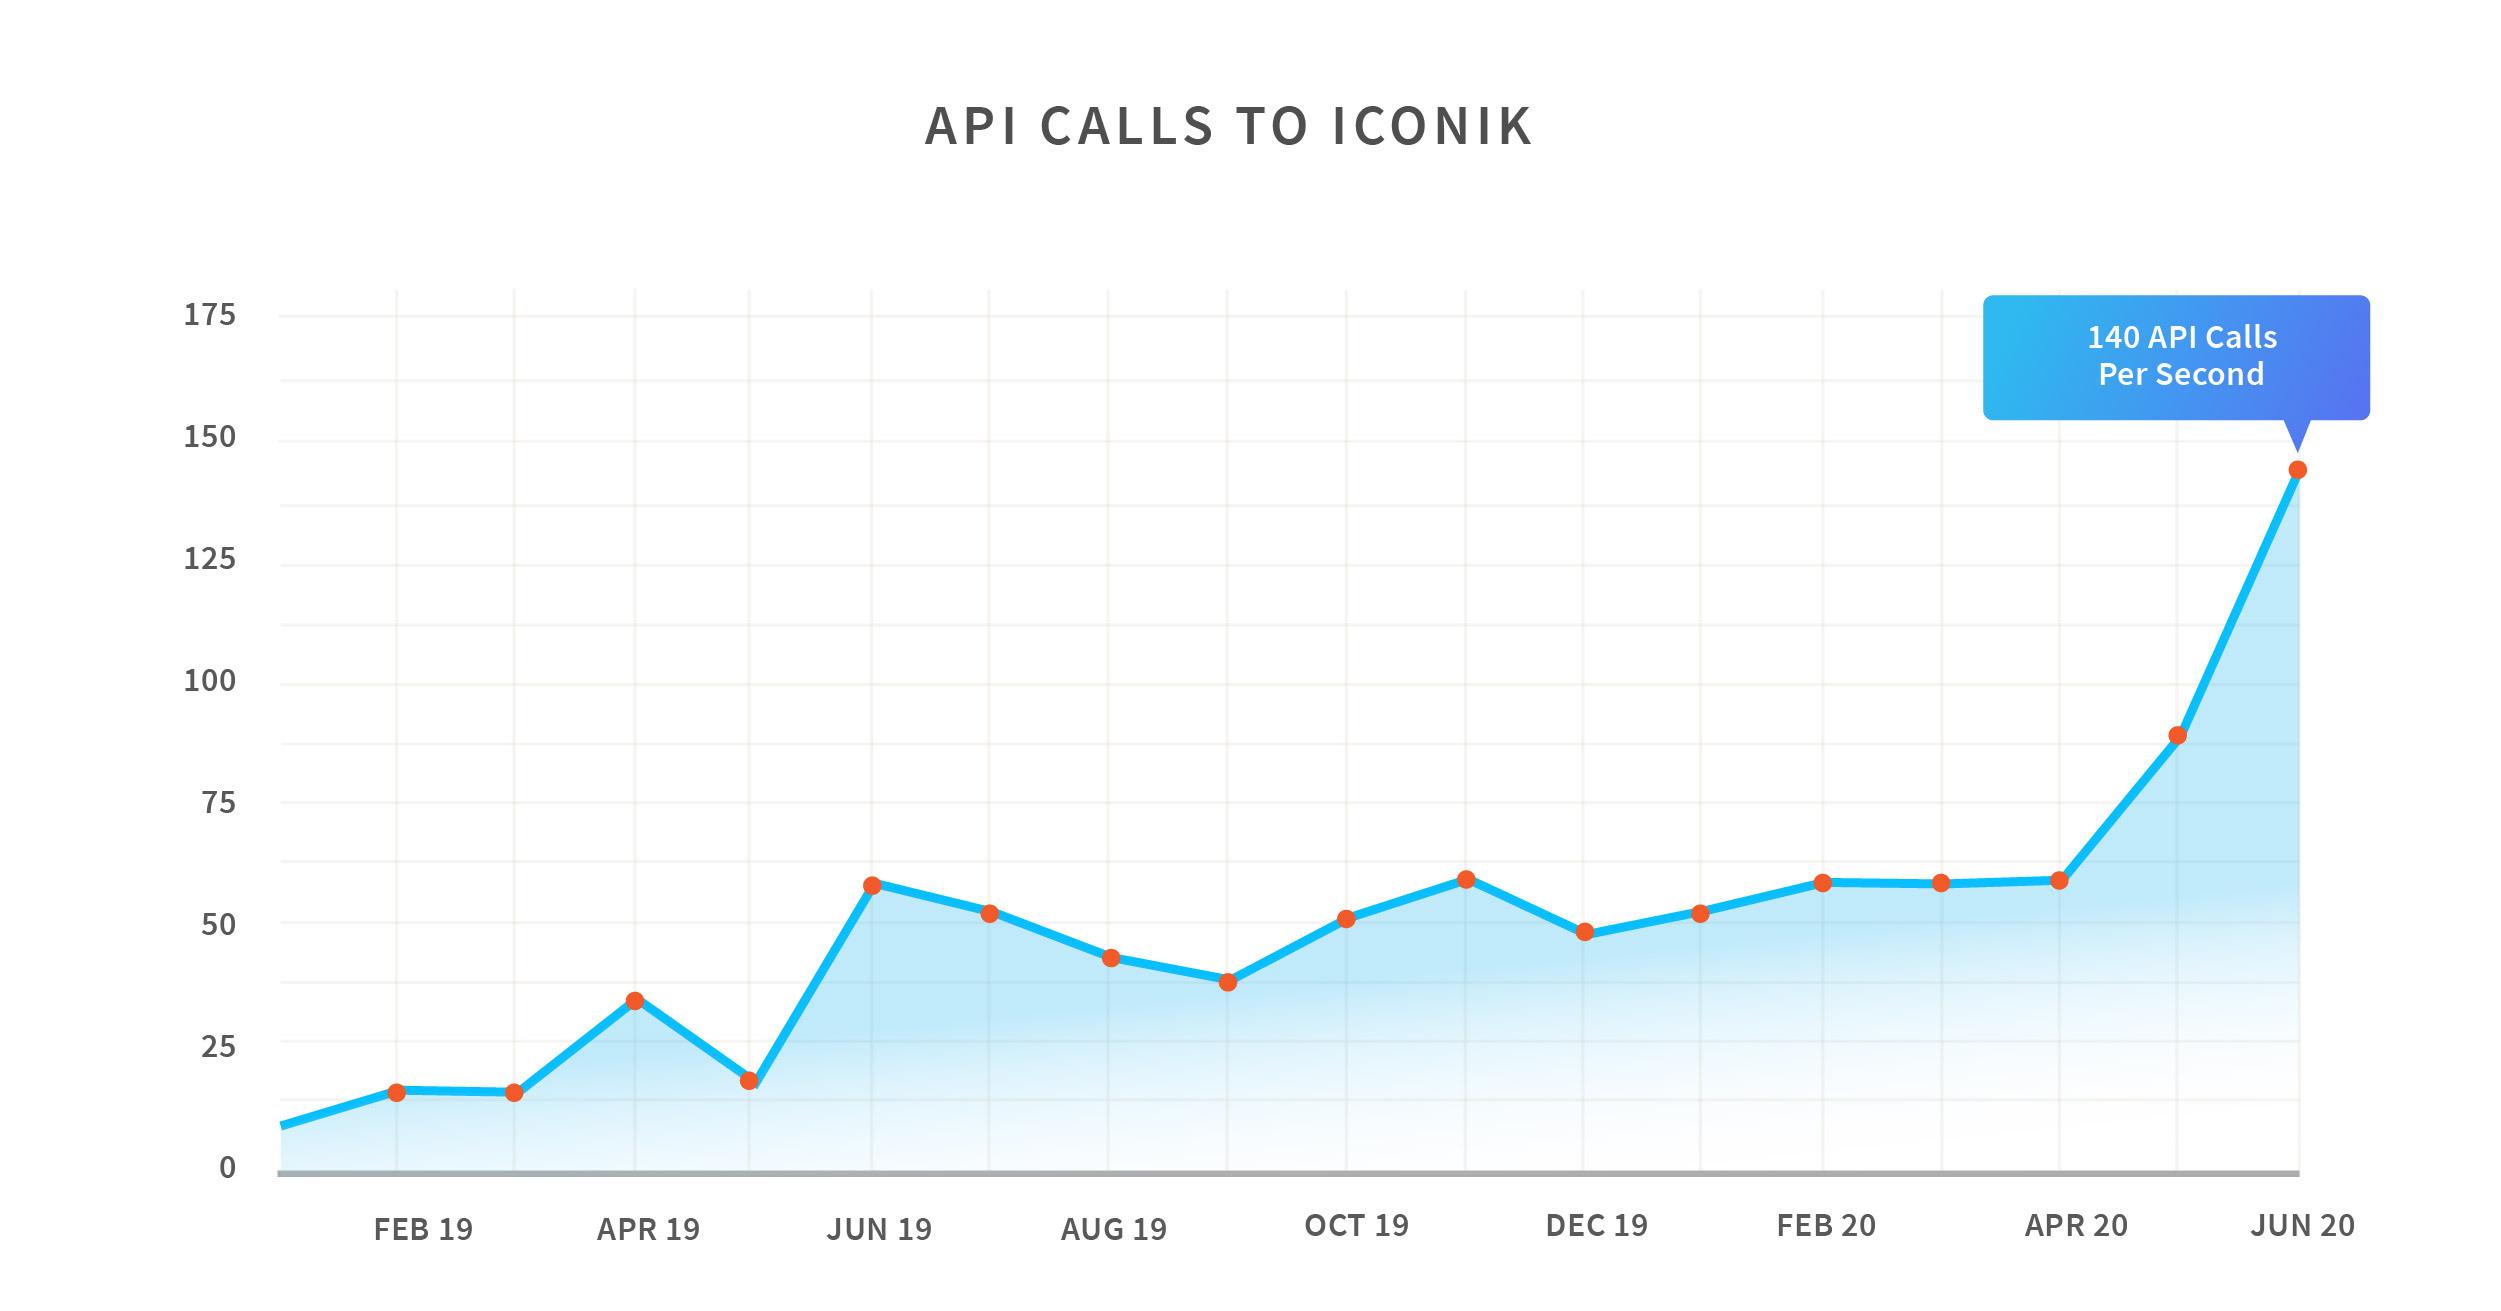 API Calls to iconik